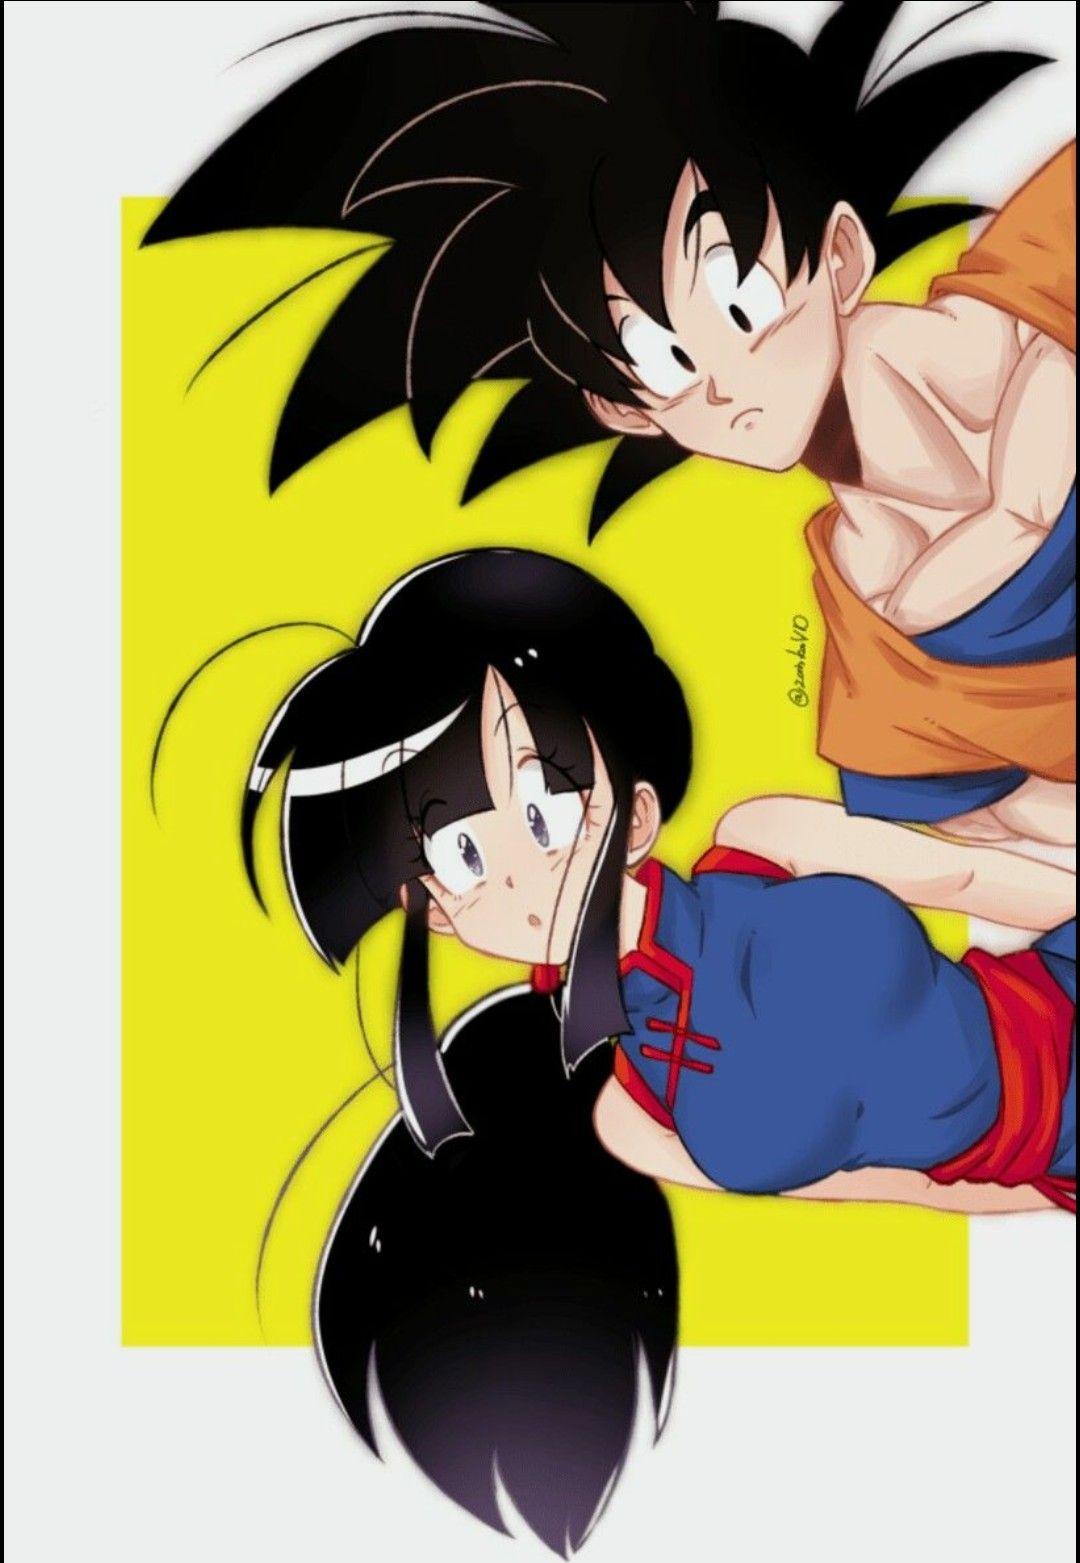 Pin By Daniel Albino On Field Hockey In 2020 Anime Dragon Ball Super Dragon Ball Super Manga Anime Dragon Ball